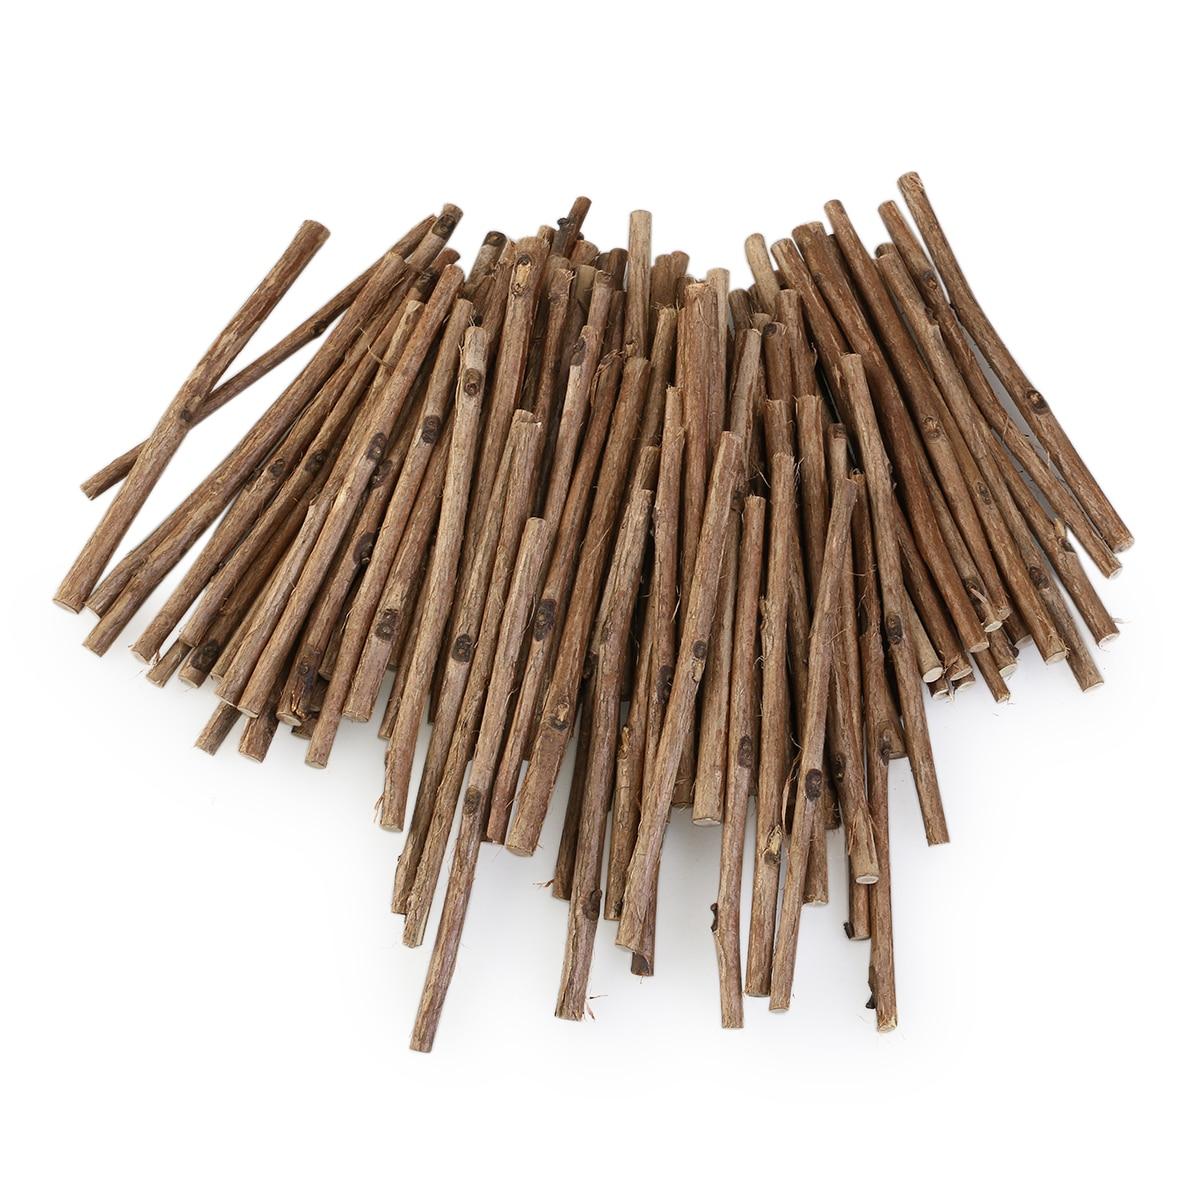 Long wooden craft sticks - 100pcs 10cm Long 0 3 0 5cm In Diameter Wood Log Sticks Diy Crafts Photo Props